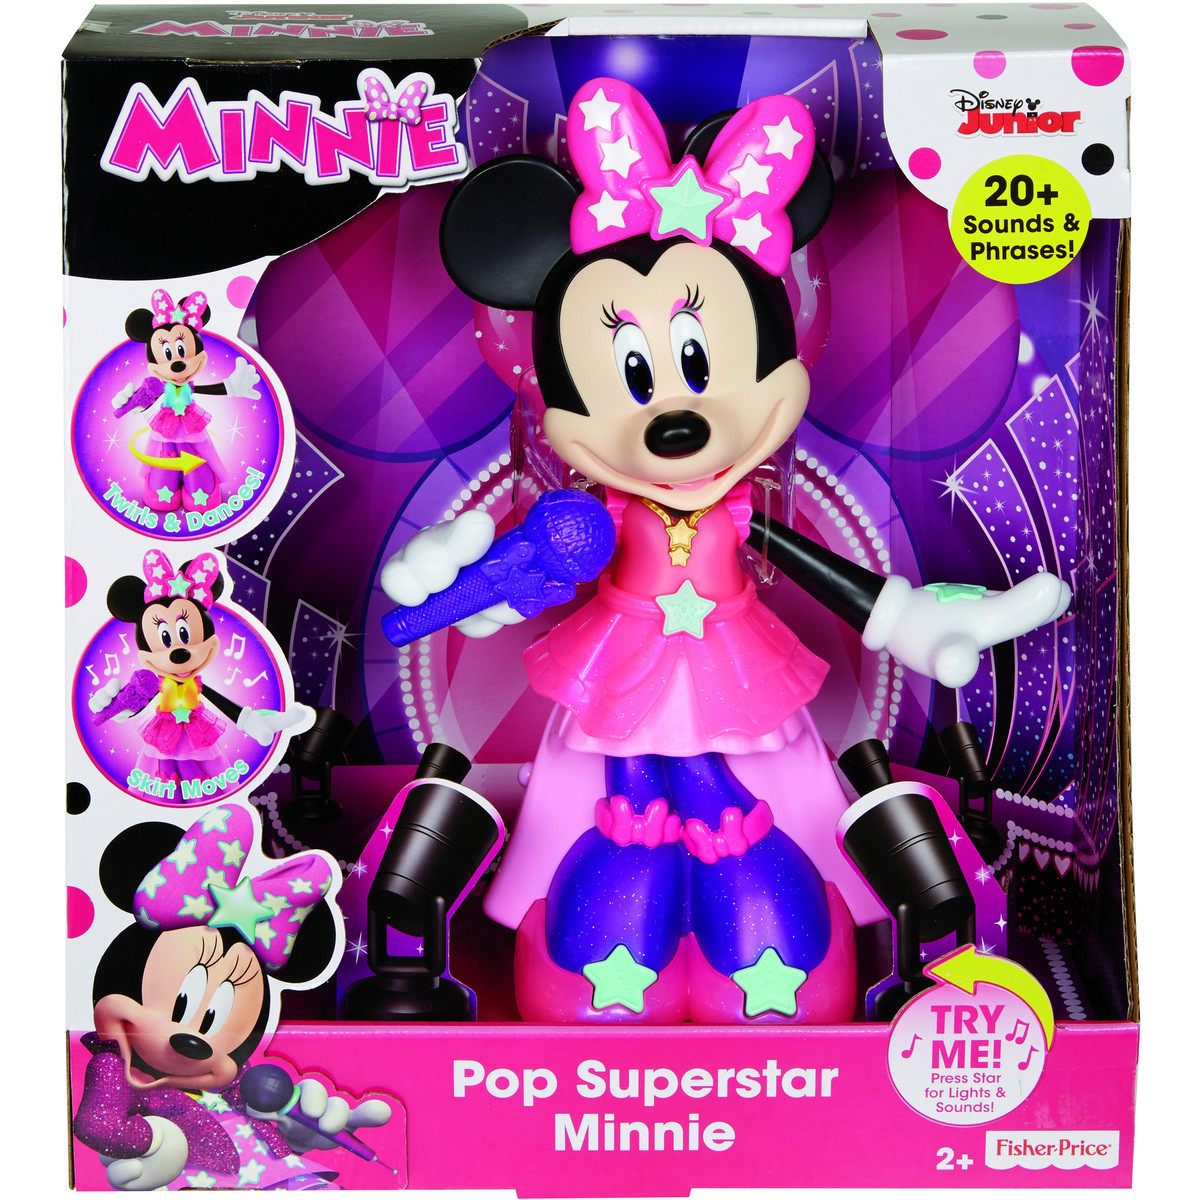 Интерактивная танцующая Мини Маус, свет, музыка, Fisher-Price Pop Superstar Minnie, Оригинал из США